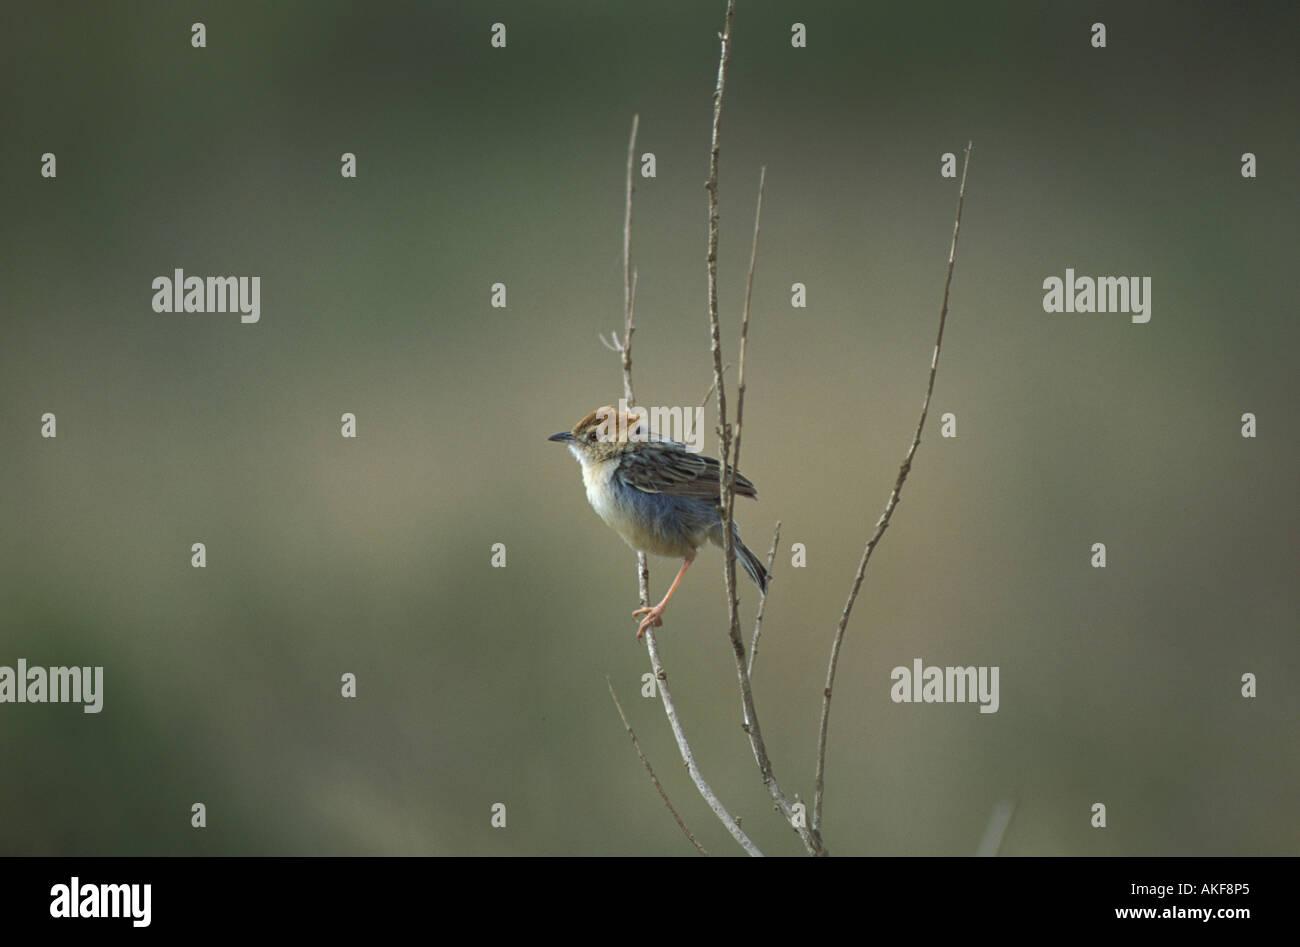 Winding Cisticola Cisticola galactotes Perched on branch - Stock Image